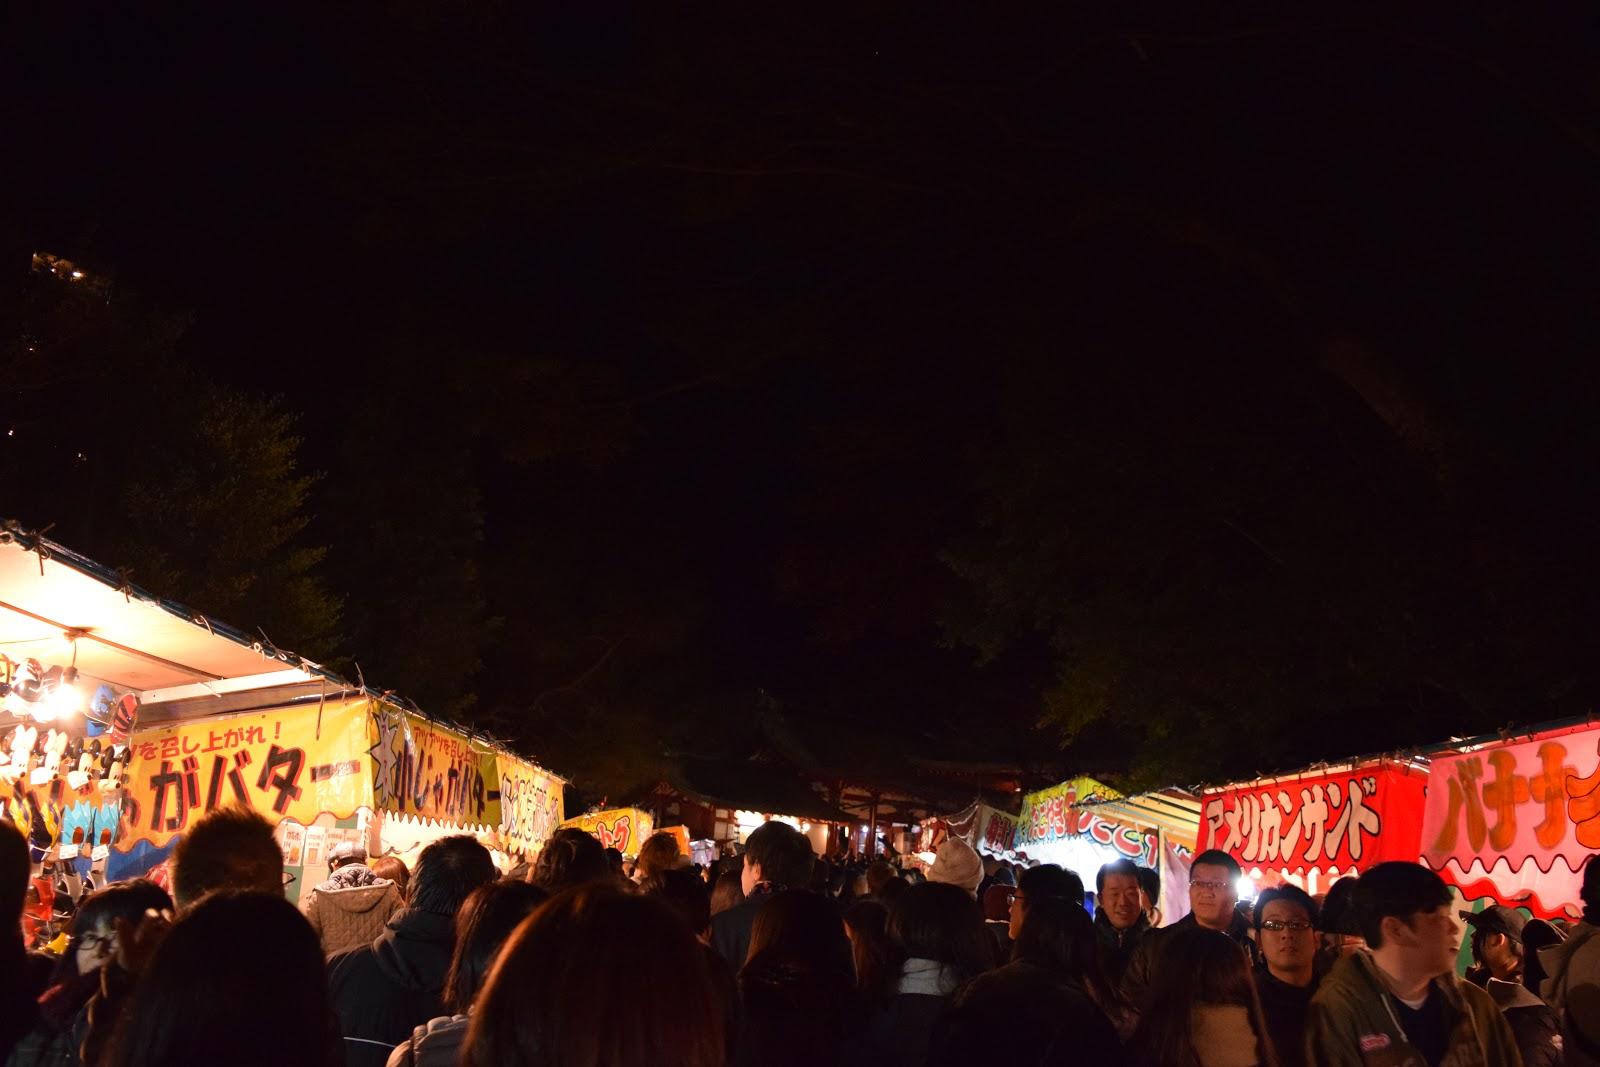 Yatai food stands at Sengen Jinja, shizuoka on New Year' Eve